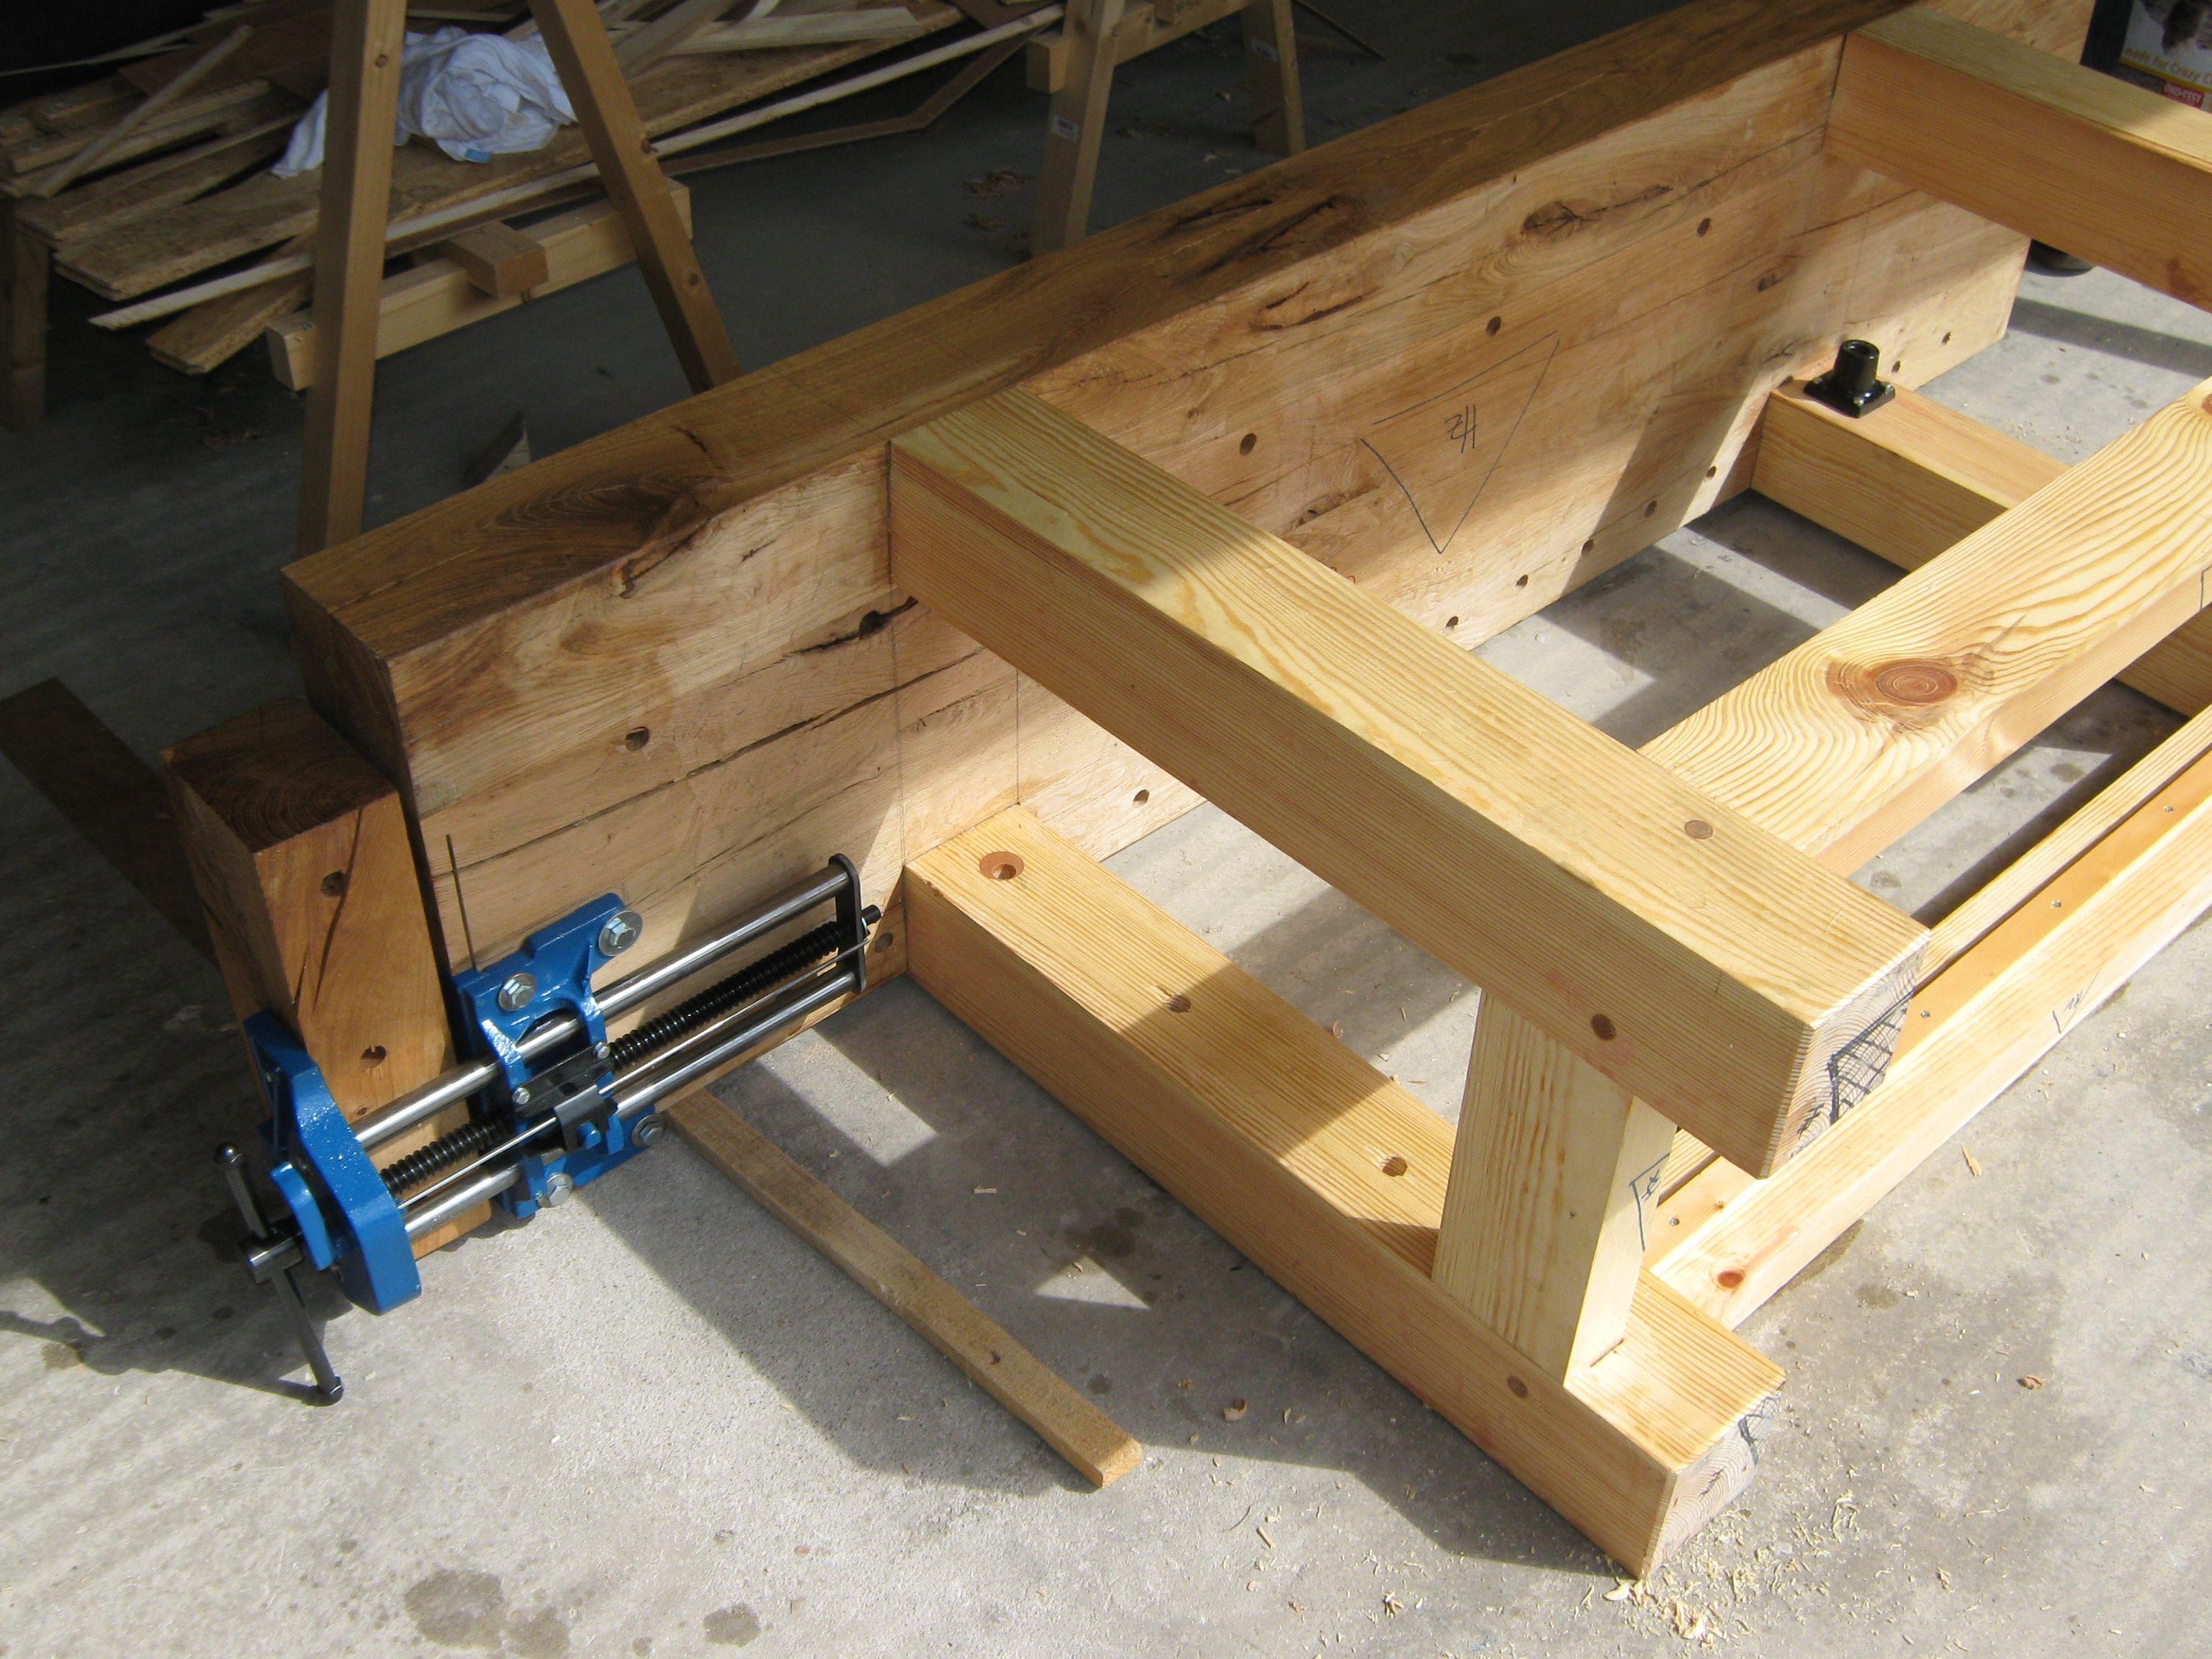 building a workbench fertigstellung der hobelbank teil 5 holz und leim. Black Bedroom Furniture Sets. Home Design Ideas